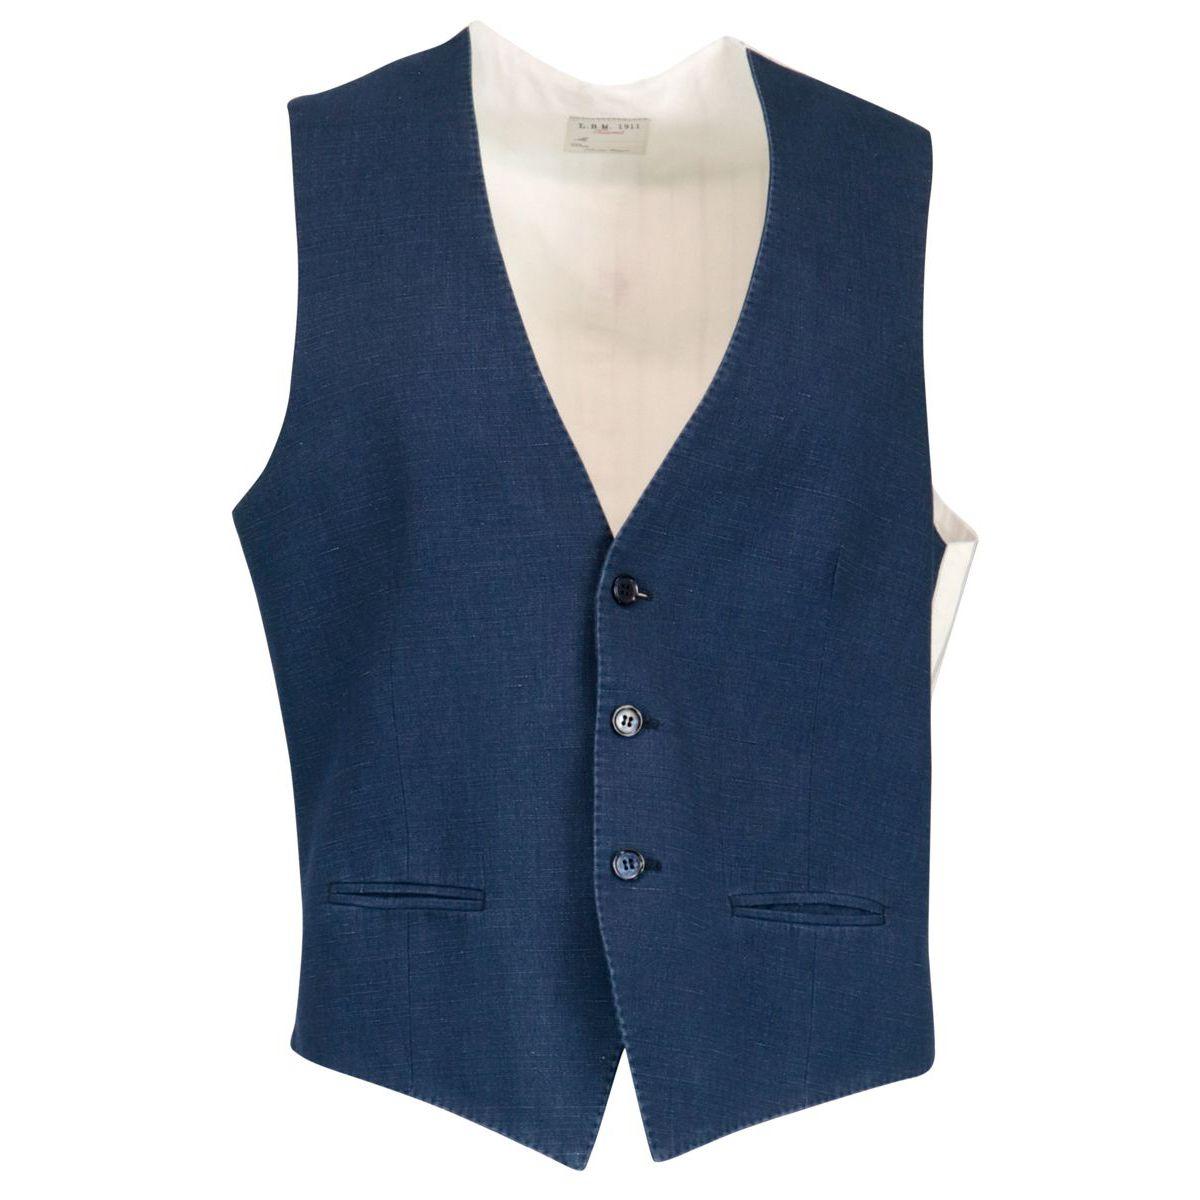 Denim effect cotton and linen waistcoat Blue L.B.M. 1911